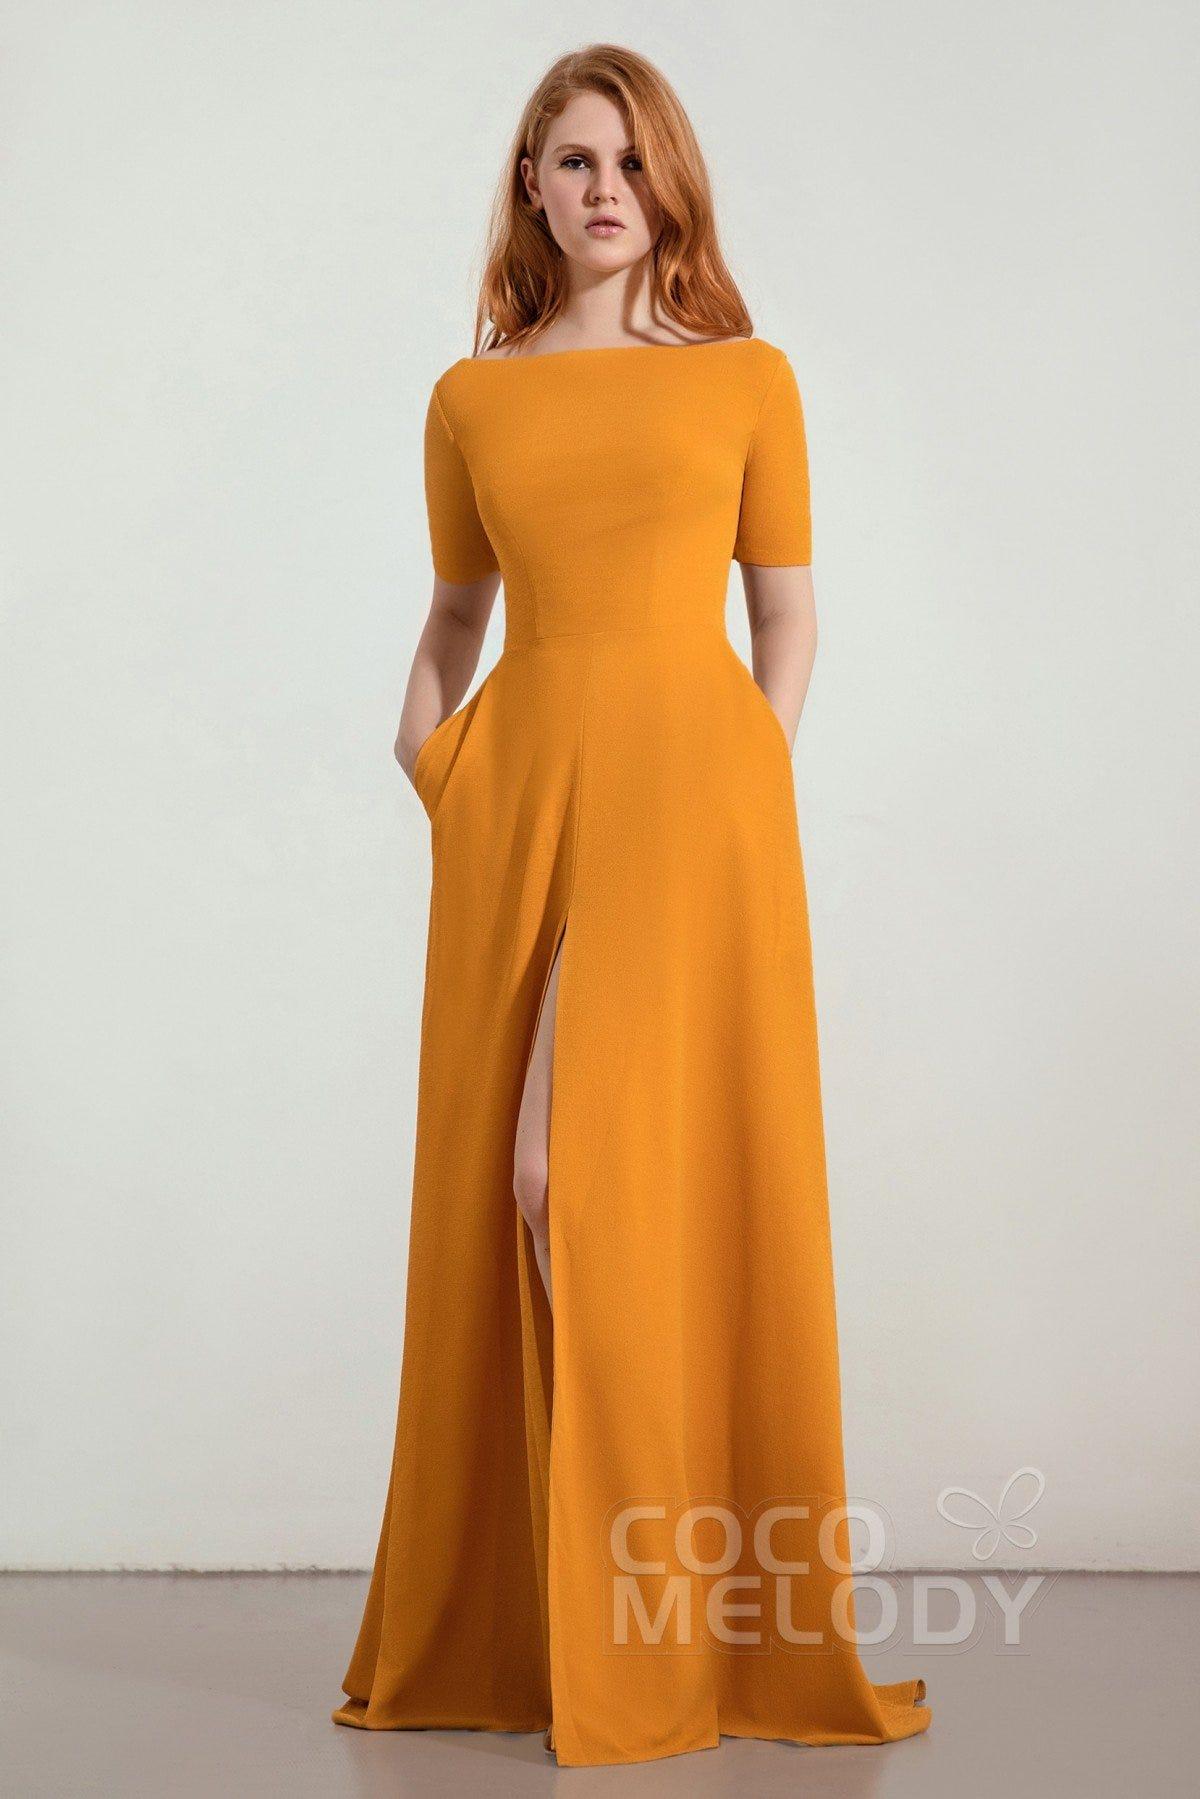 07cd514e7f Affordable Bridesmaid Dresses - Cheap Wedding Style